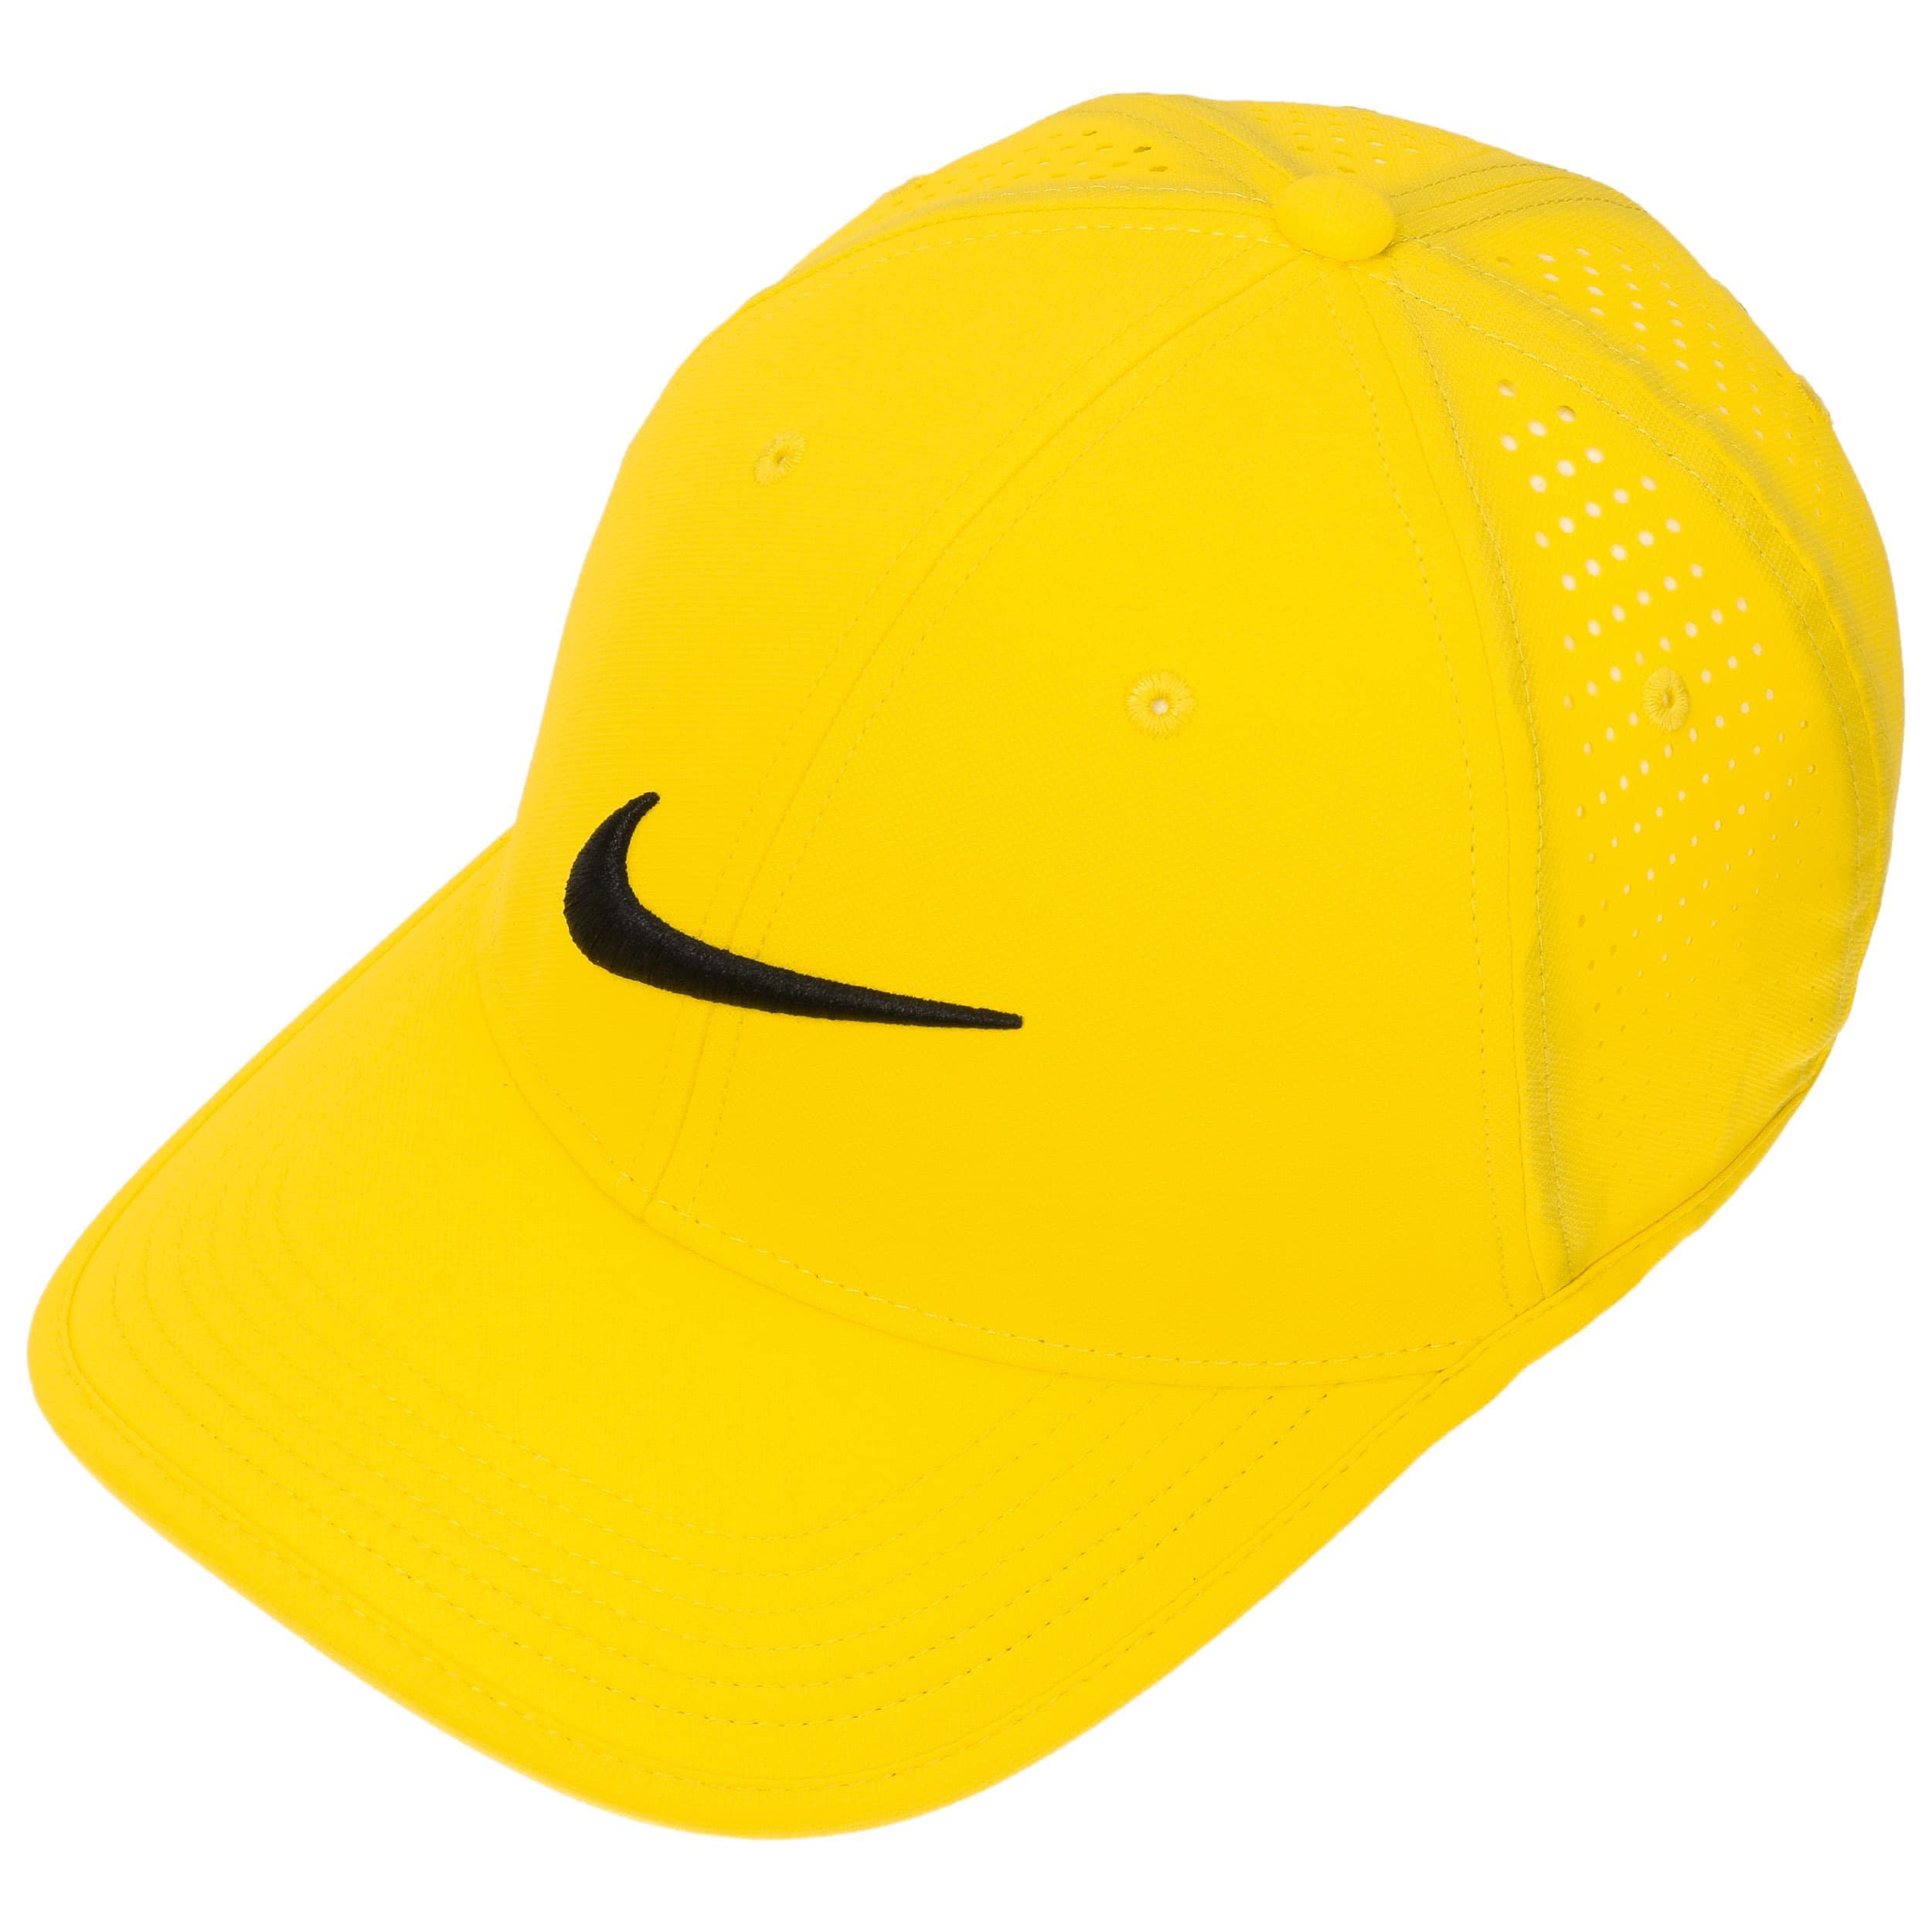 Gorra Ultralight Tour Perforation by Nike - Gorras - sombreroshop.es a6fcd15e81d